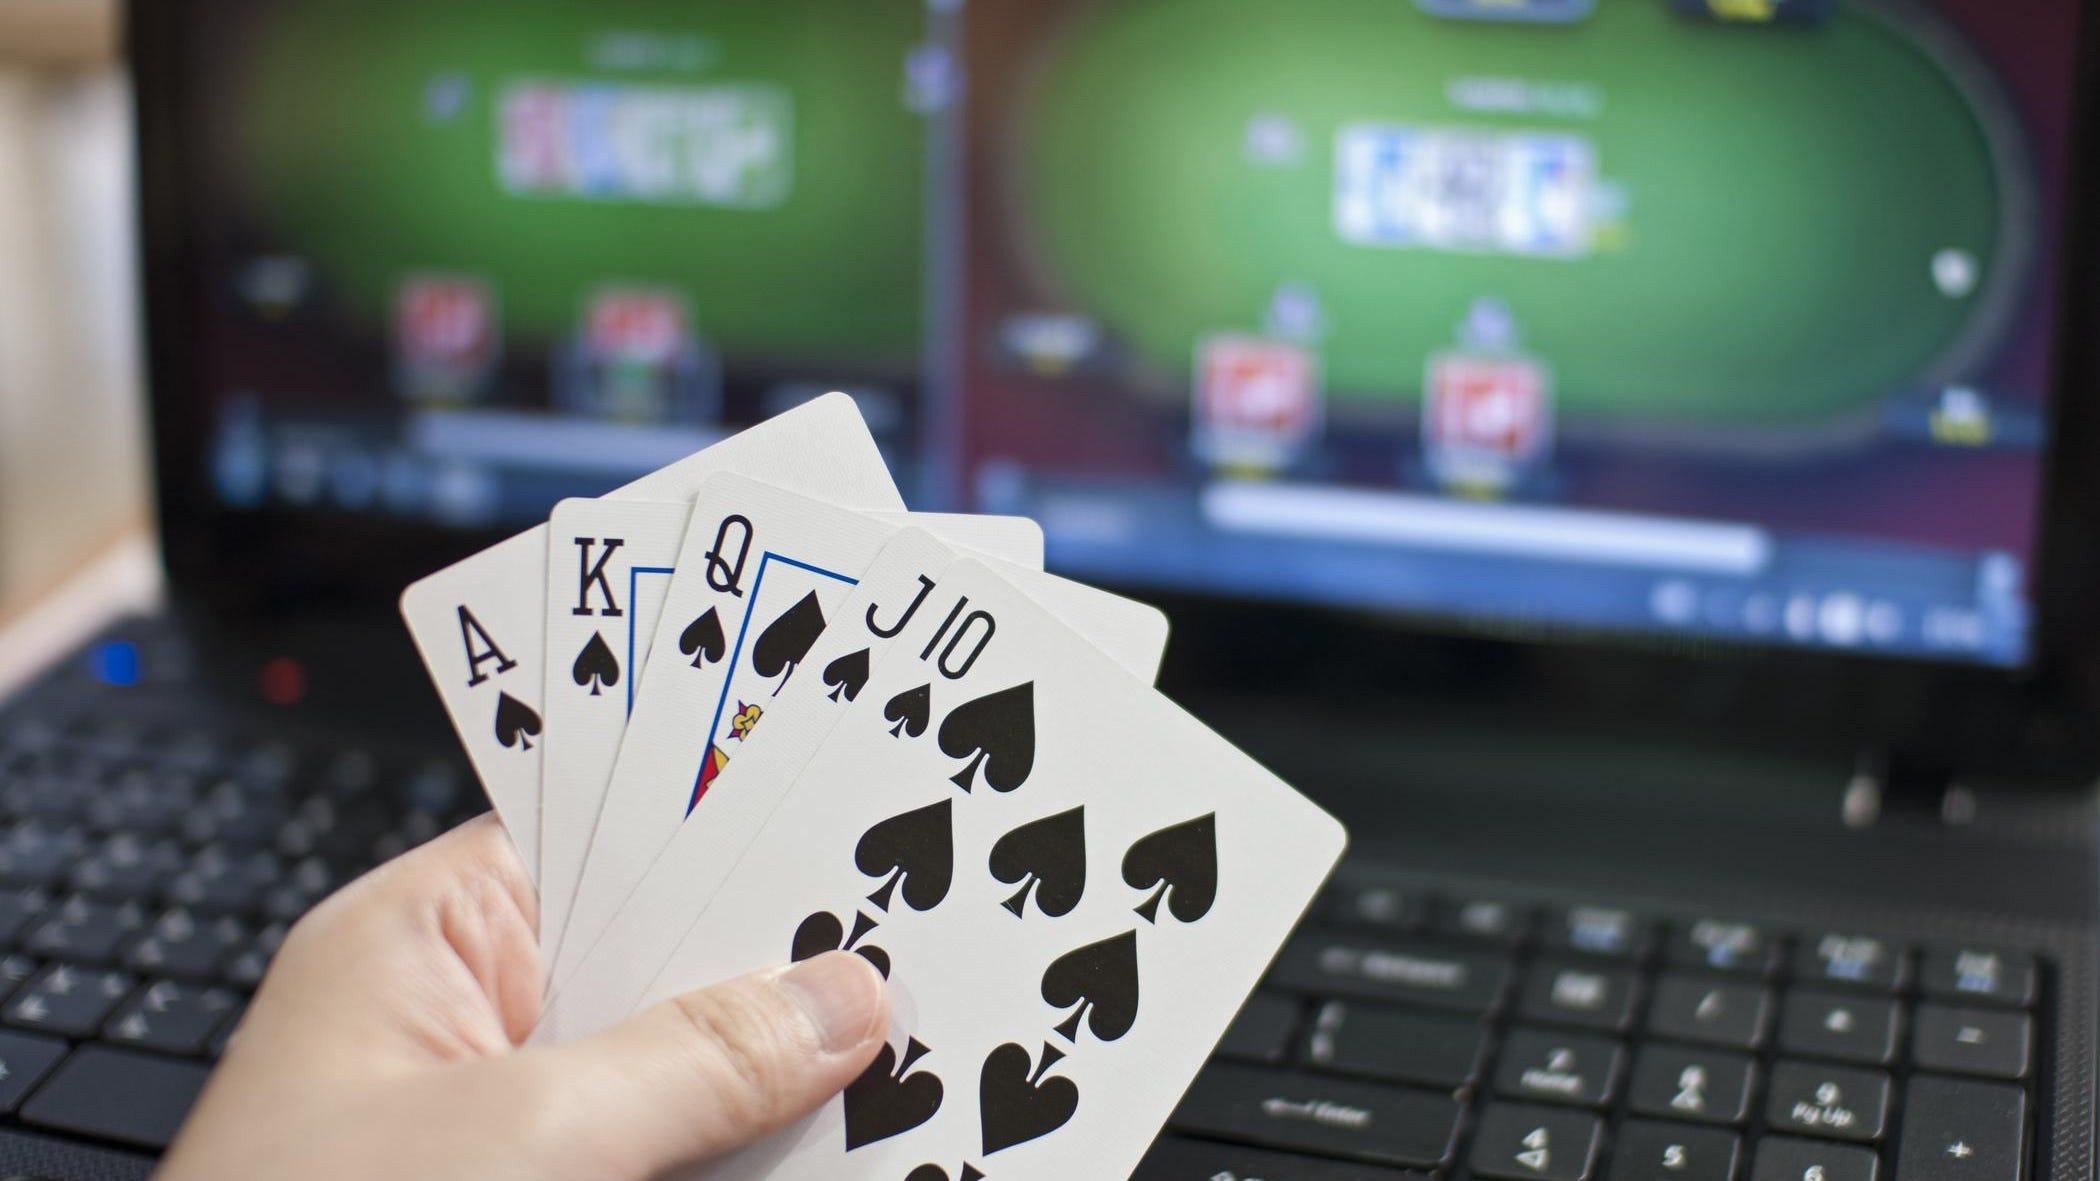 Онлайн покер 1 на 1 карты в майнкрафт на которых играл мистик